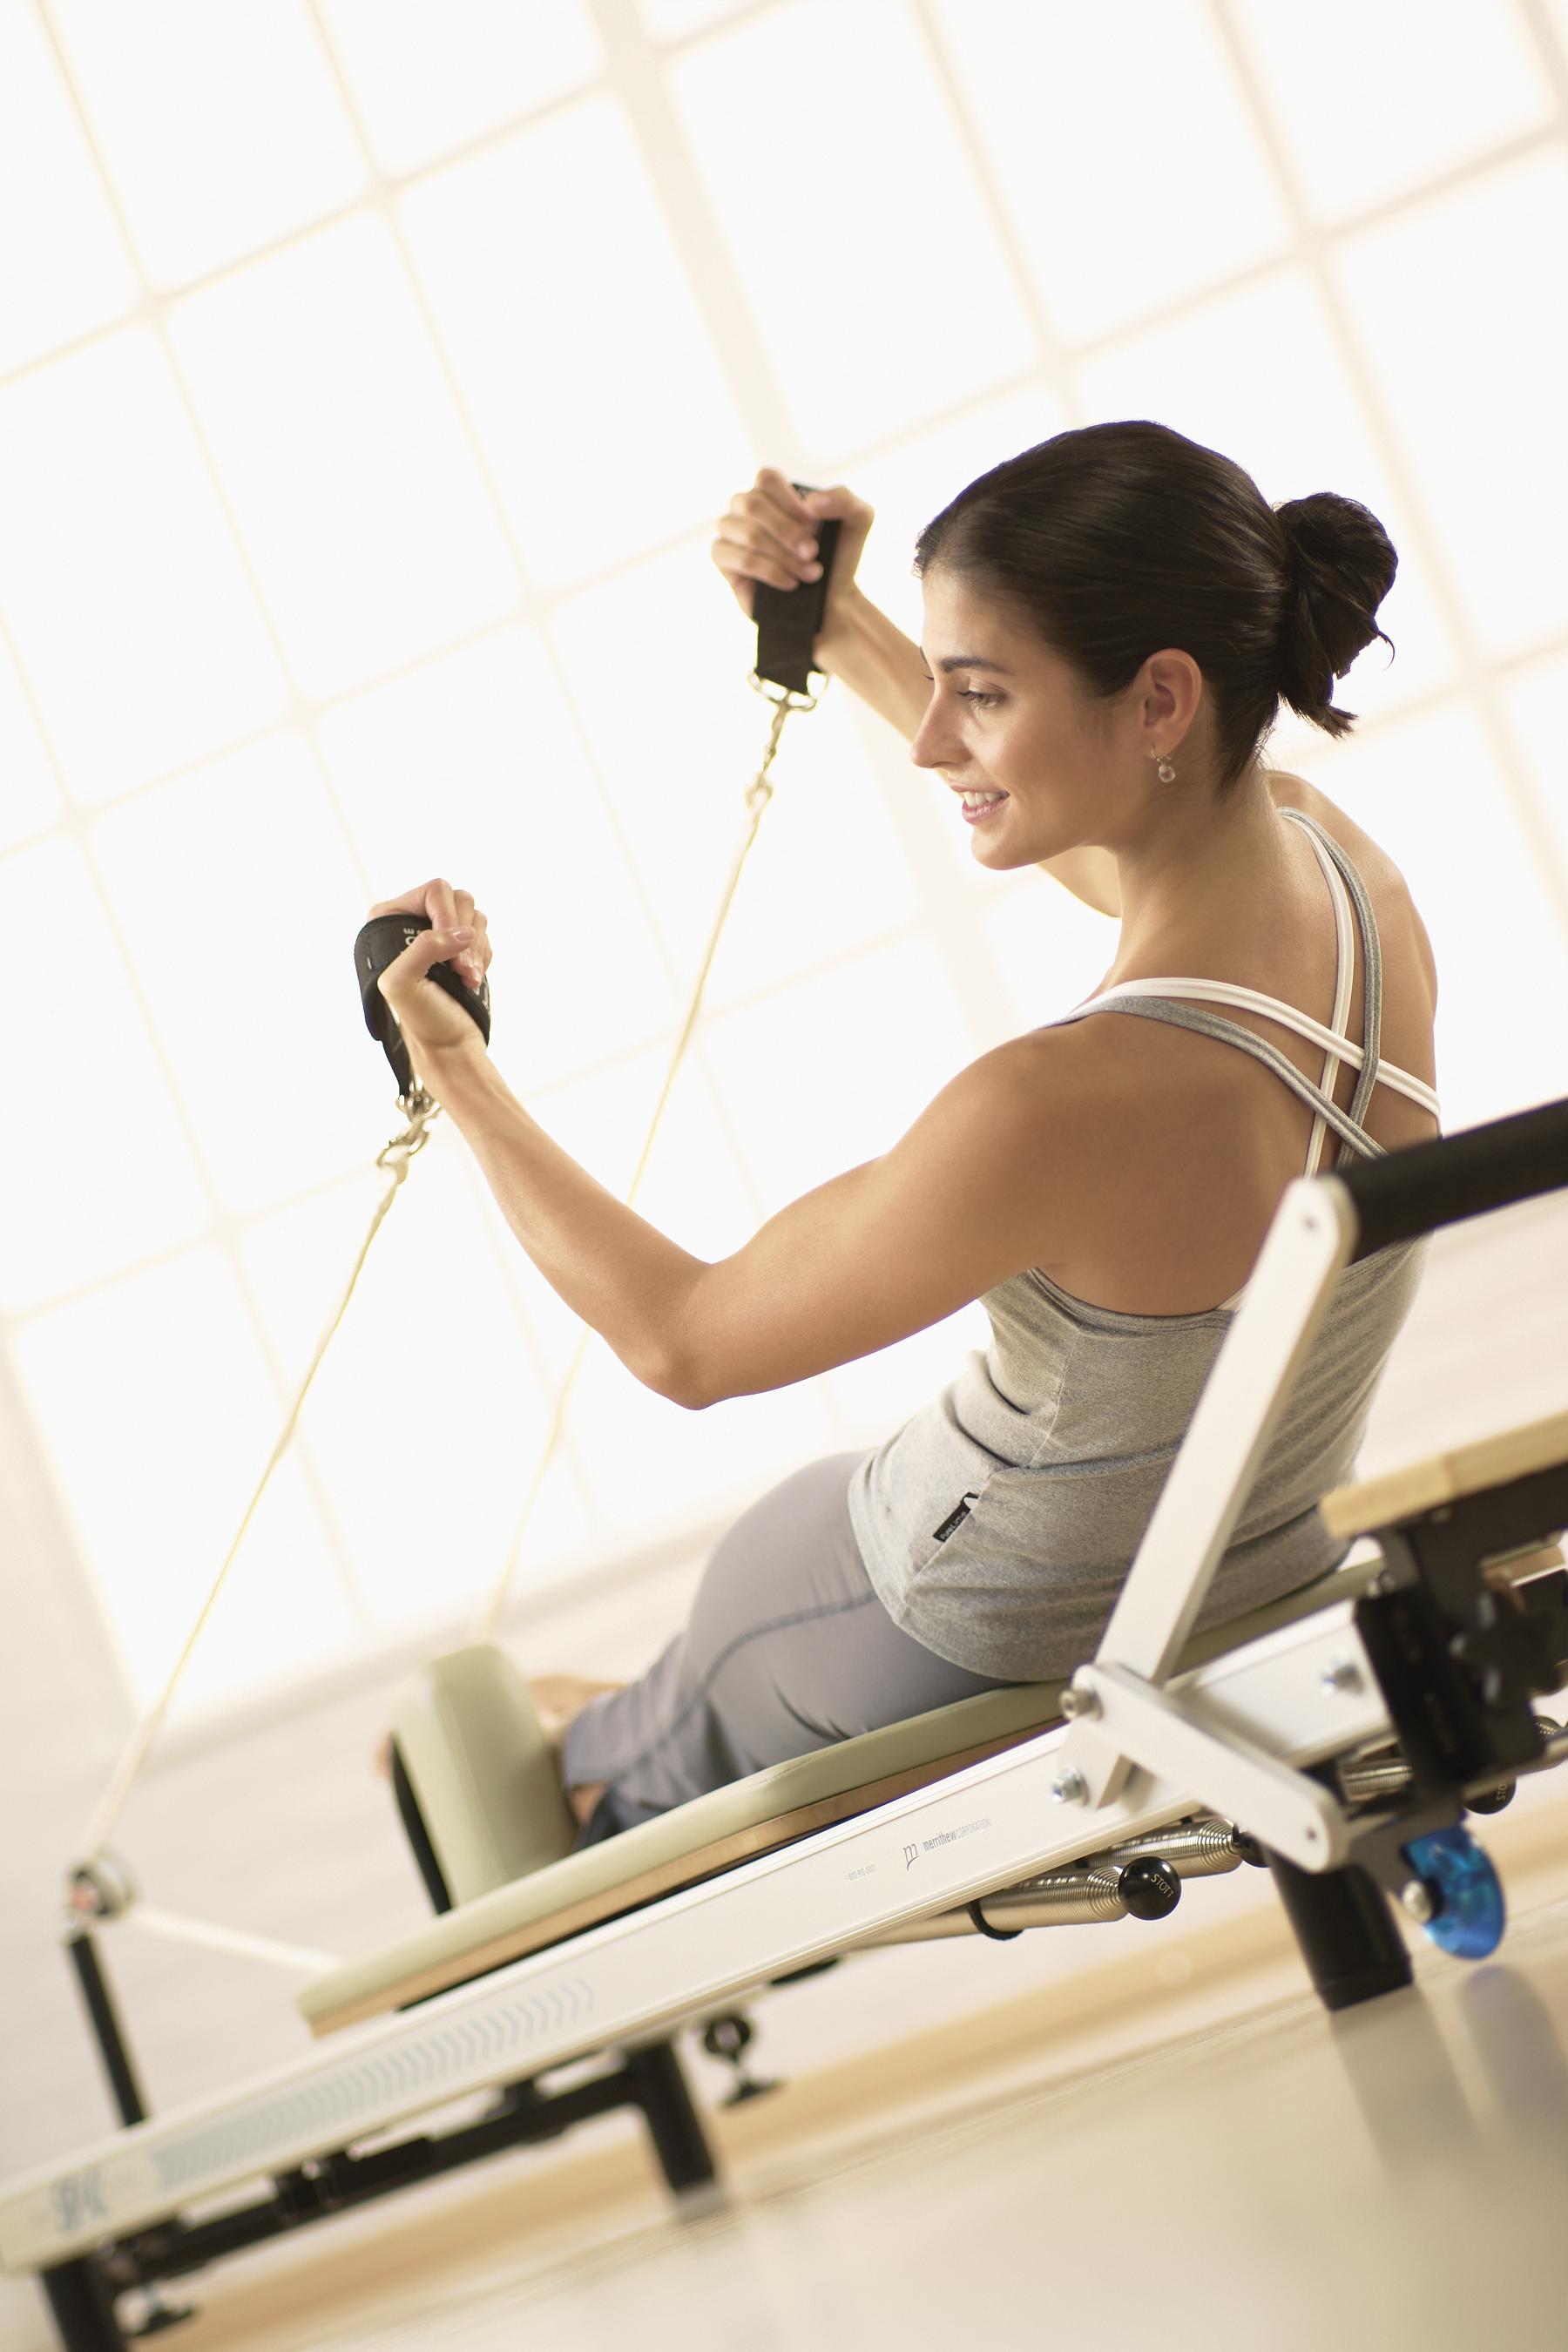 Oxfordshire Pilates